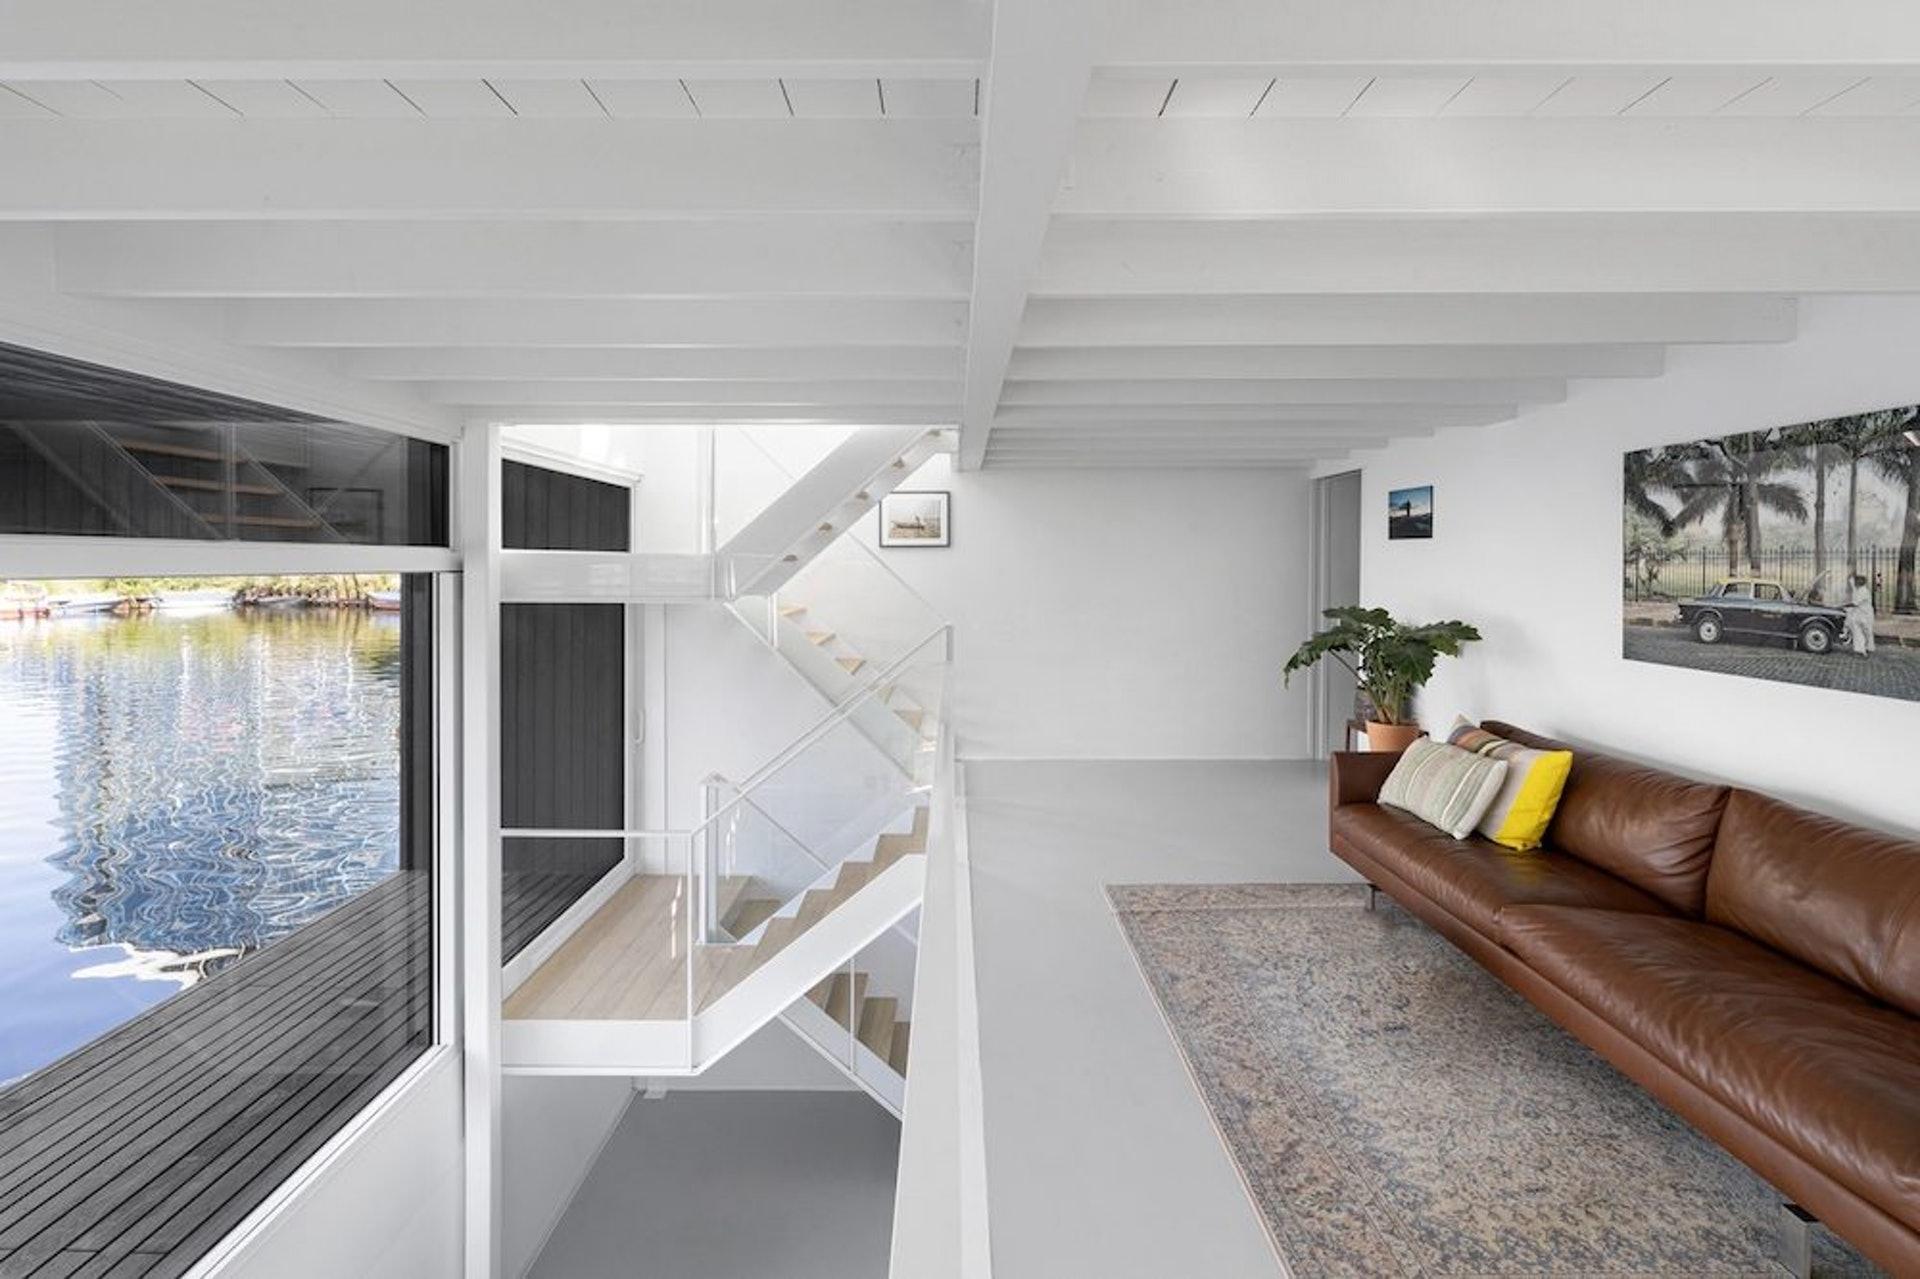 Schoonschip內裡卻充滿明亮溫暖感,跟外牆建築形成強烈對比。(SPACE&MATTER)